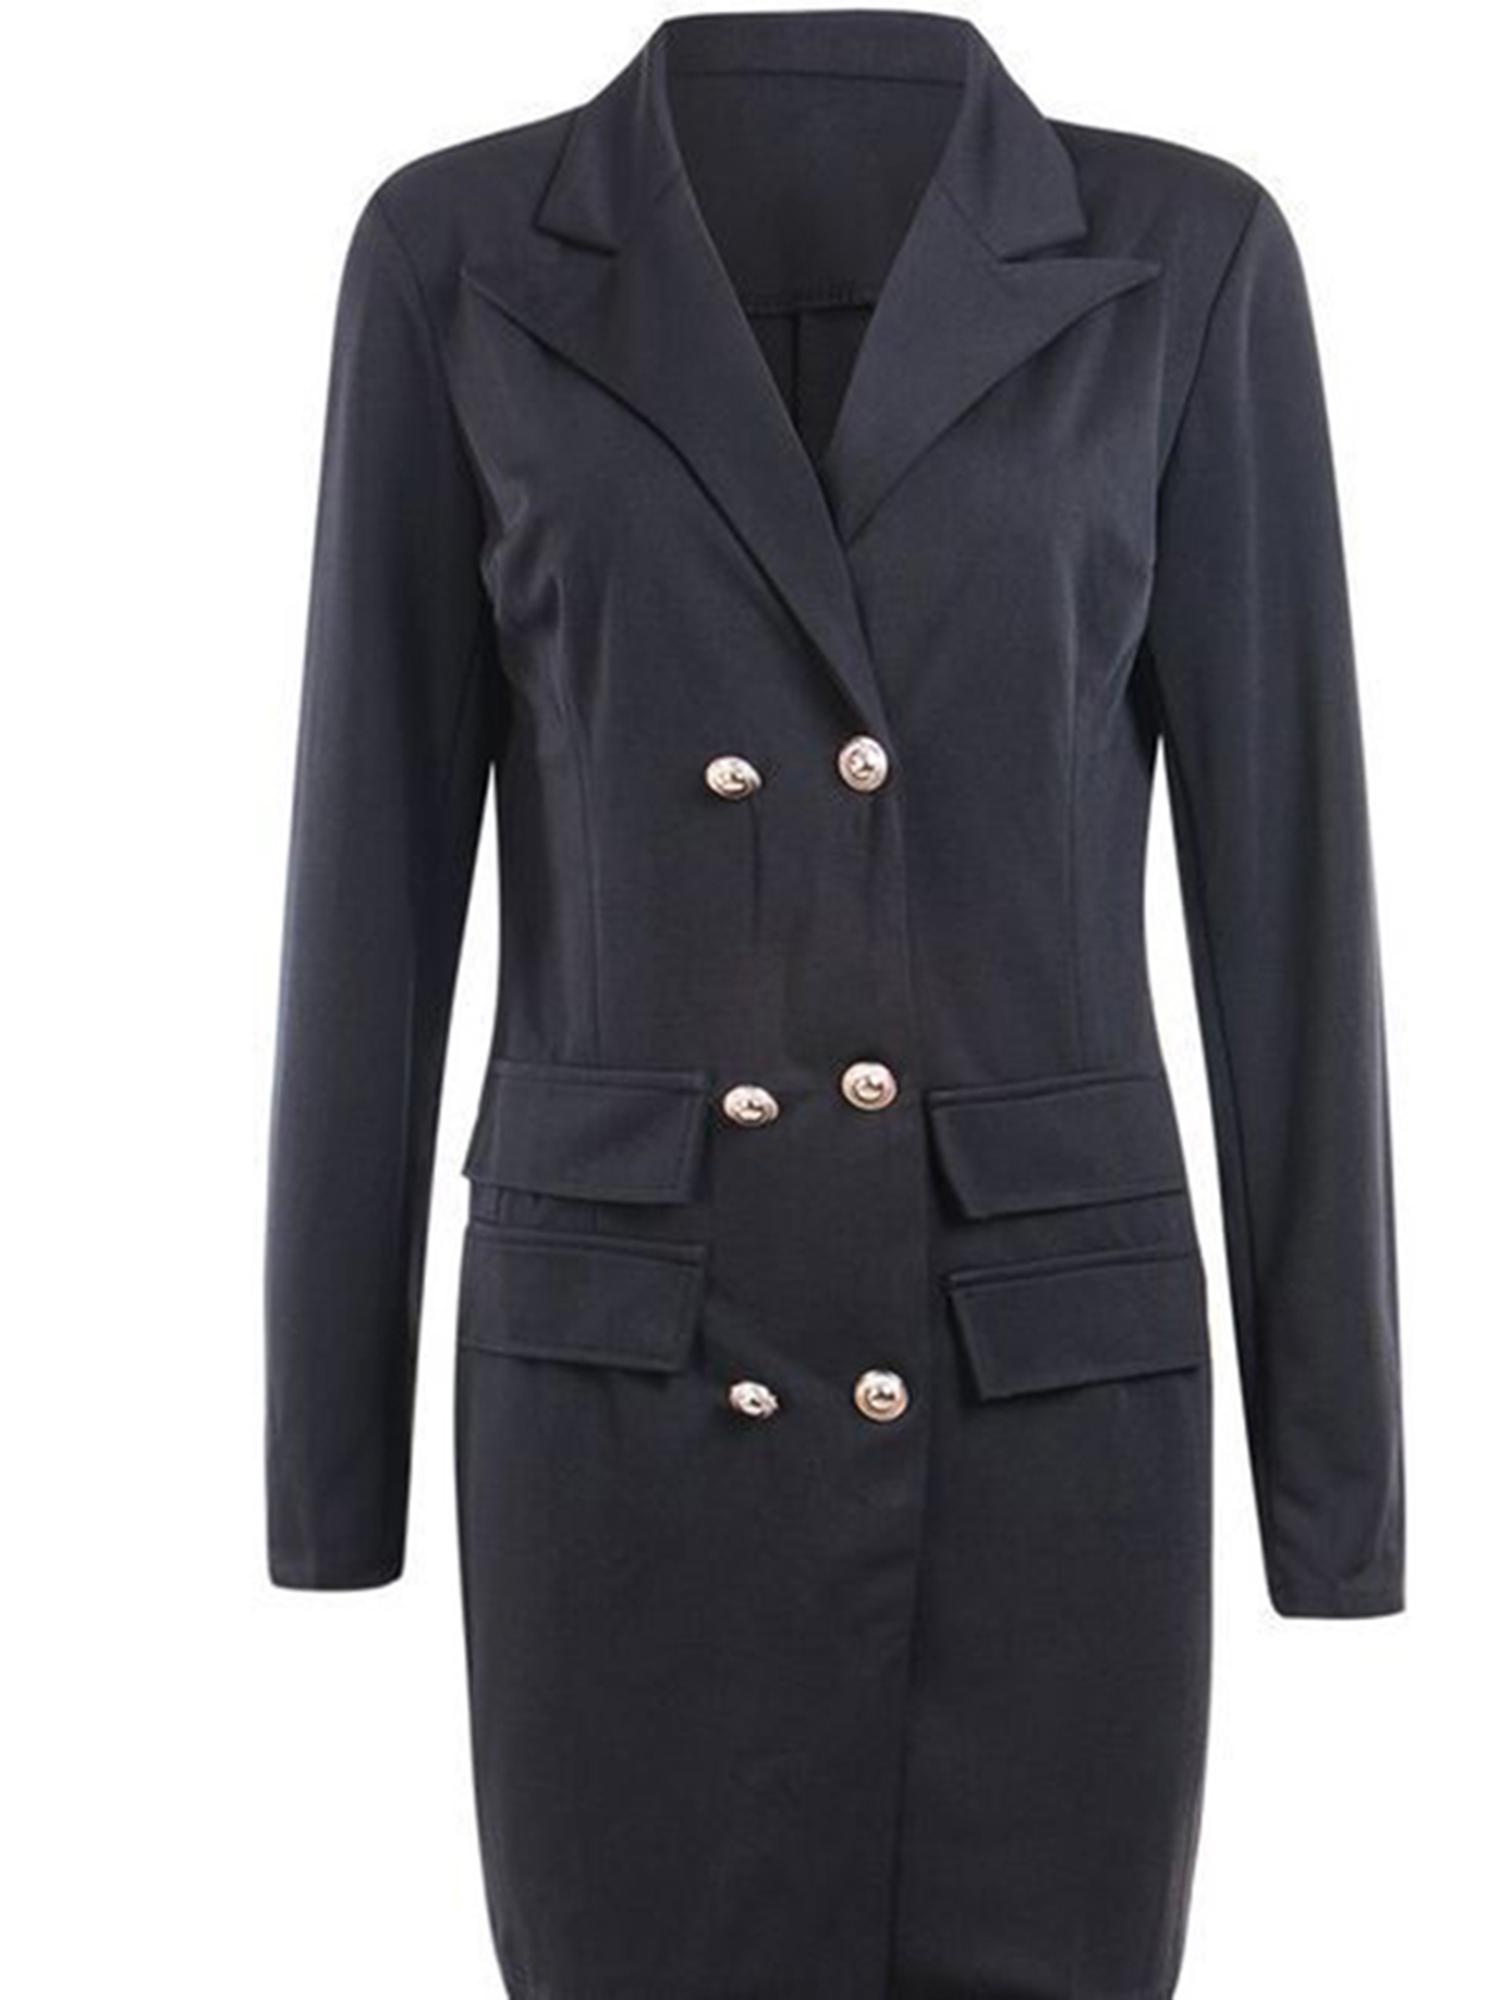 Vintage-Women-Double-Breasted-Plaid-Long-Blazer-Ladies-Jackets-Suits-Coat-Pocket miniatura 32